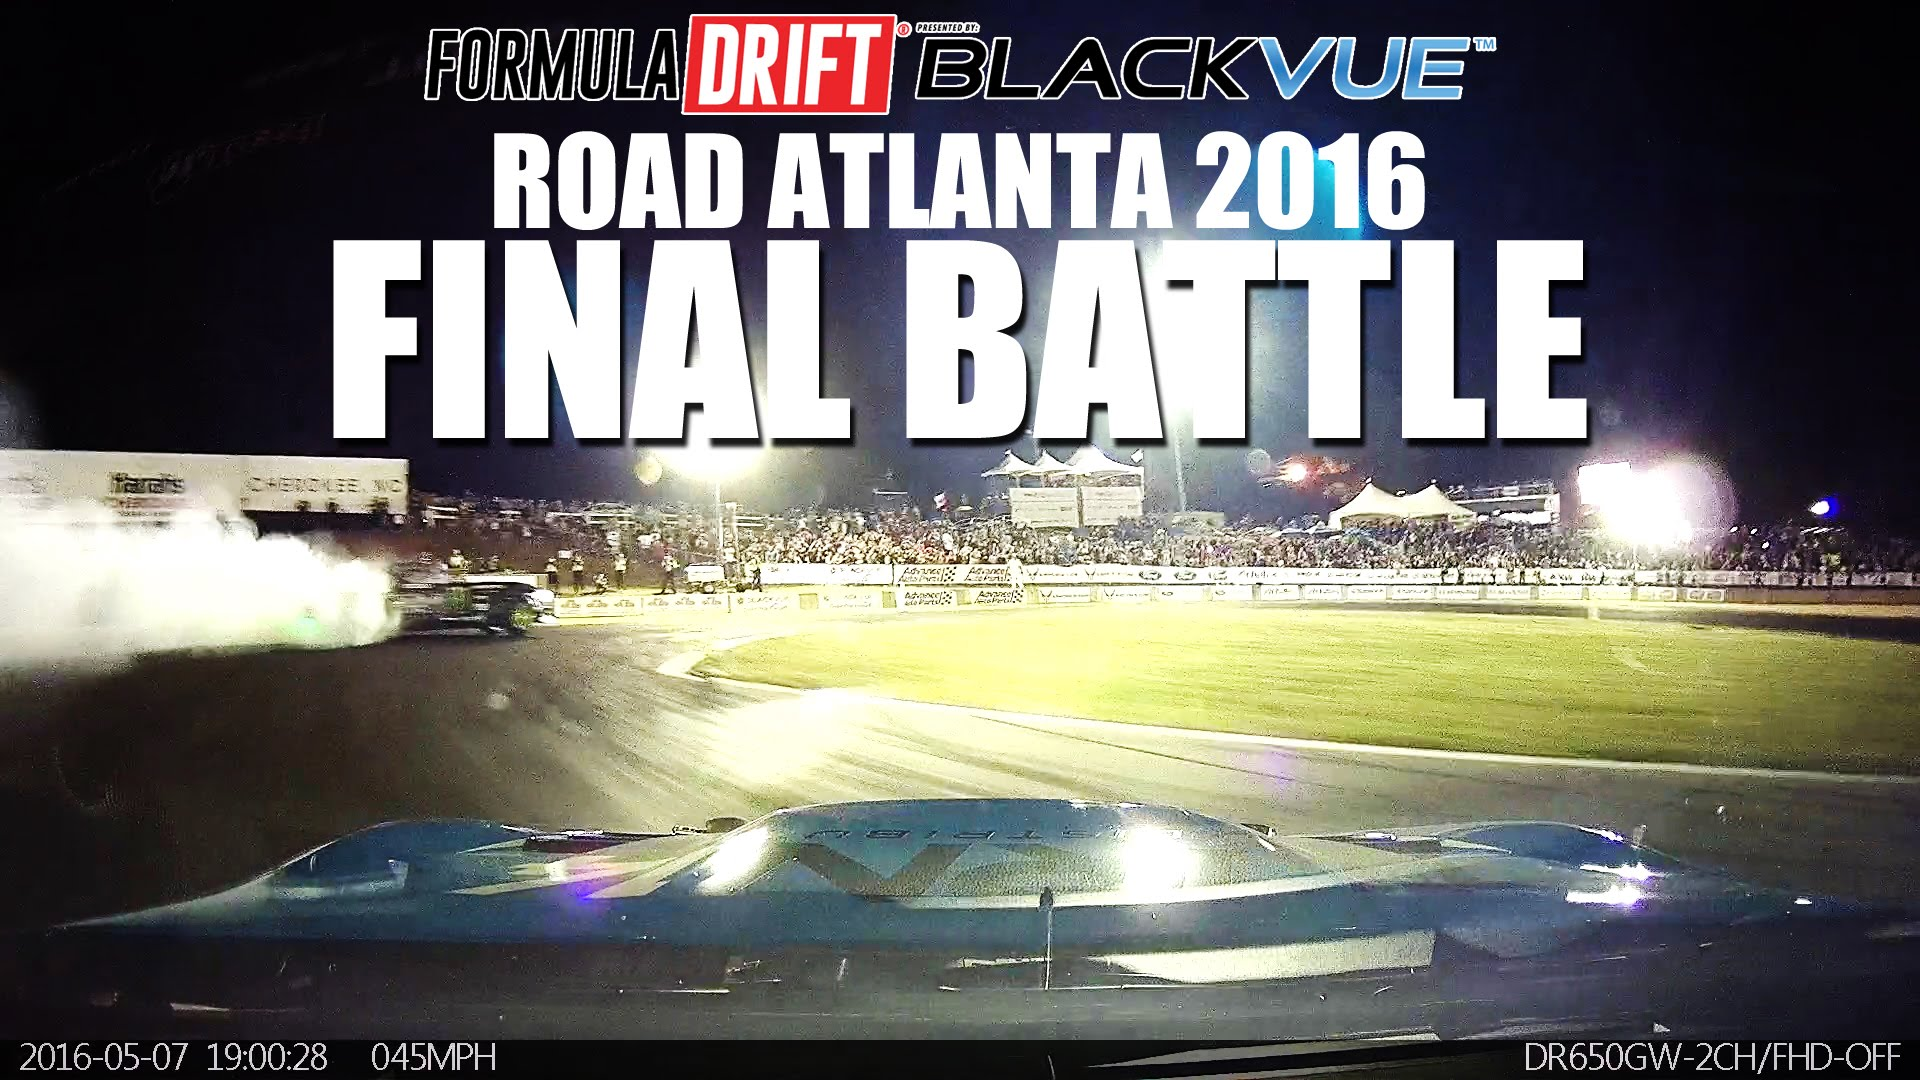 BLACKVUE x FORMULA DRIFT: Road Atlanta Final Battle!